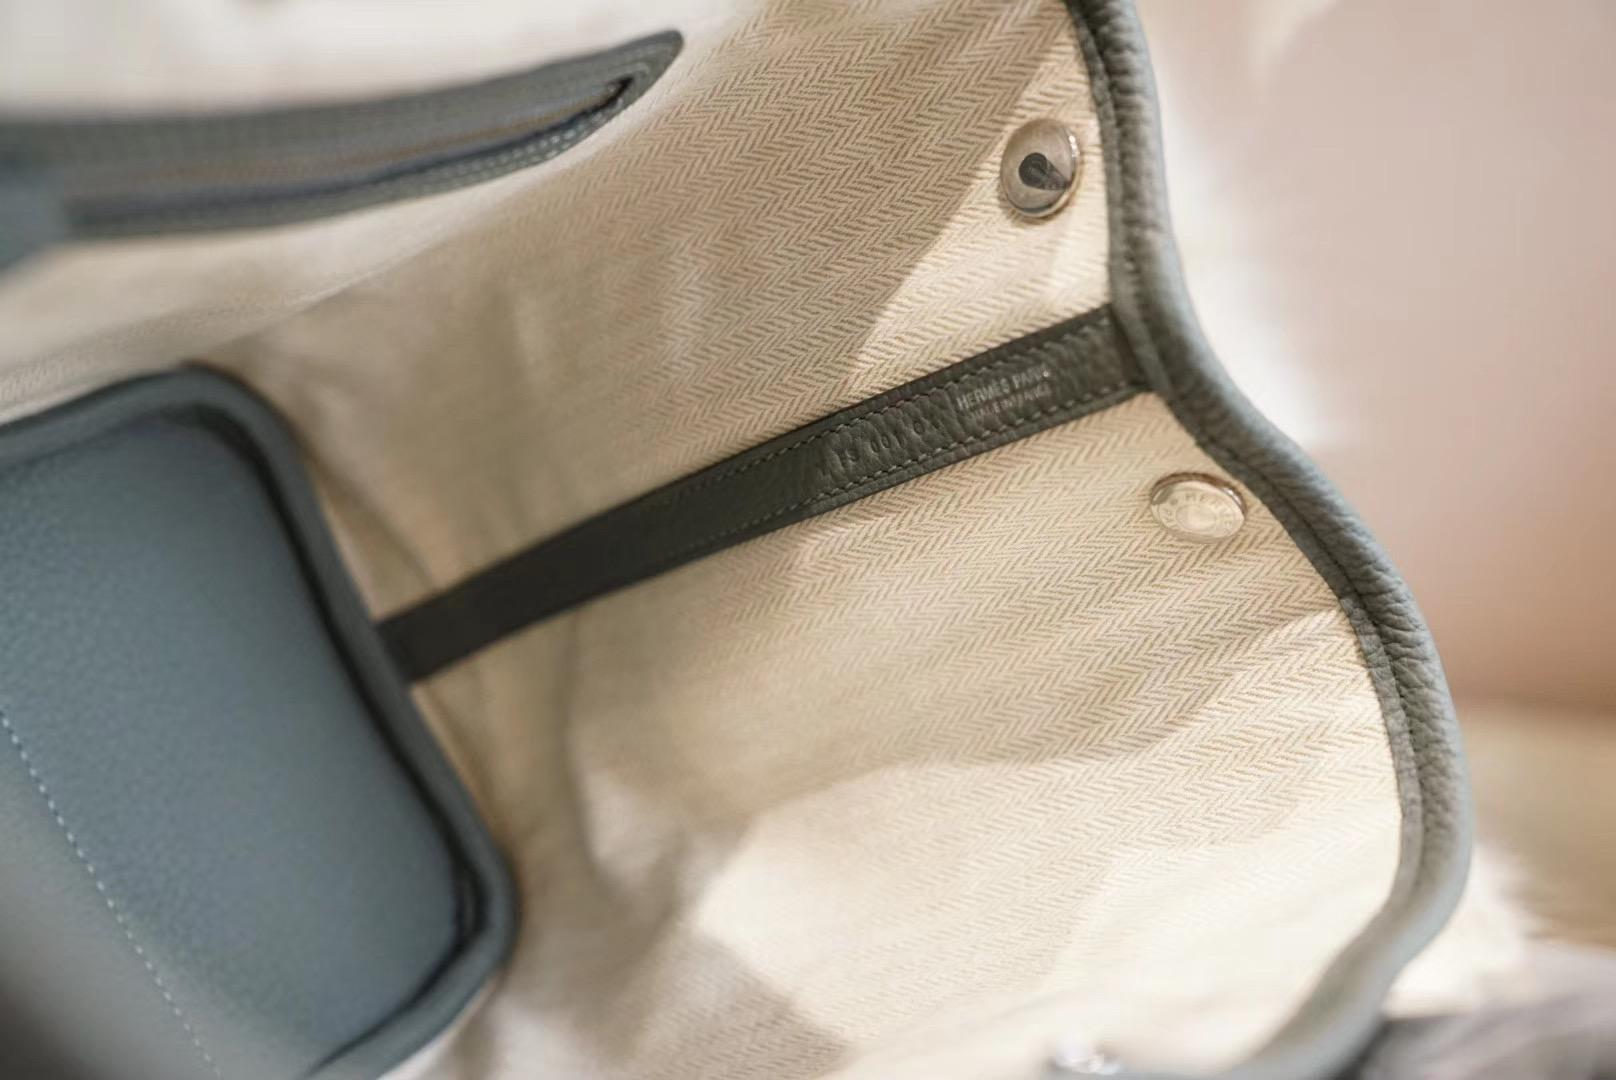 Hermes Garden Party C63杏仁绿 花园包30 原厂Negonda皮 容量超棒的一款实用型美包